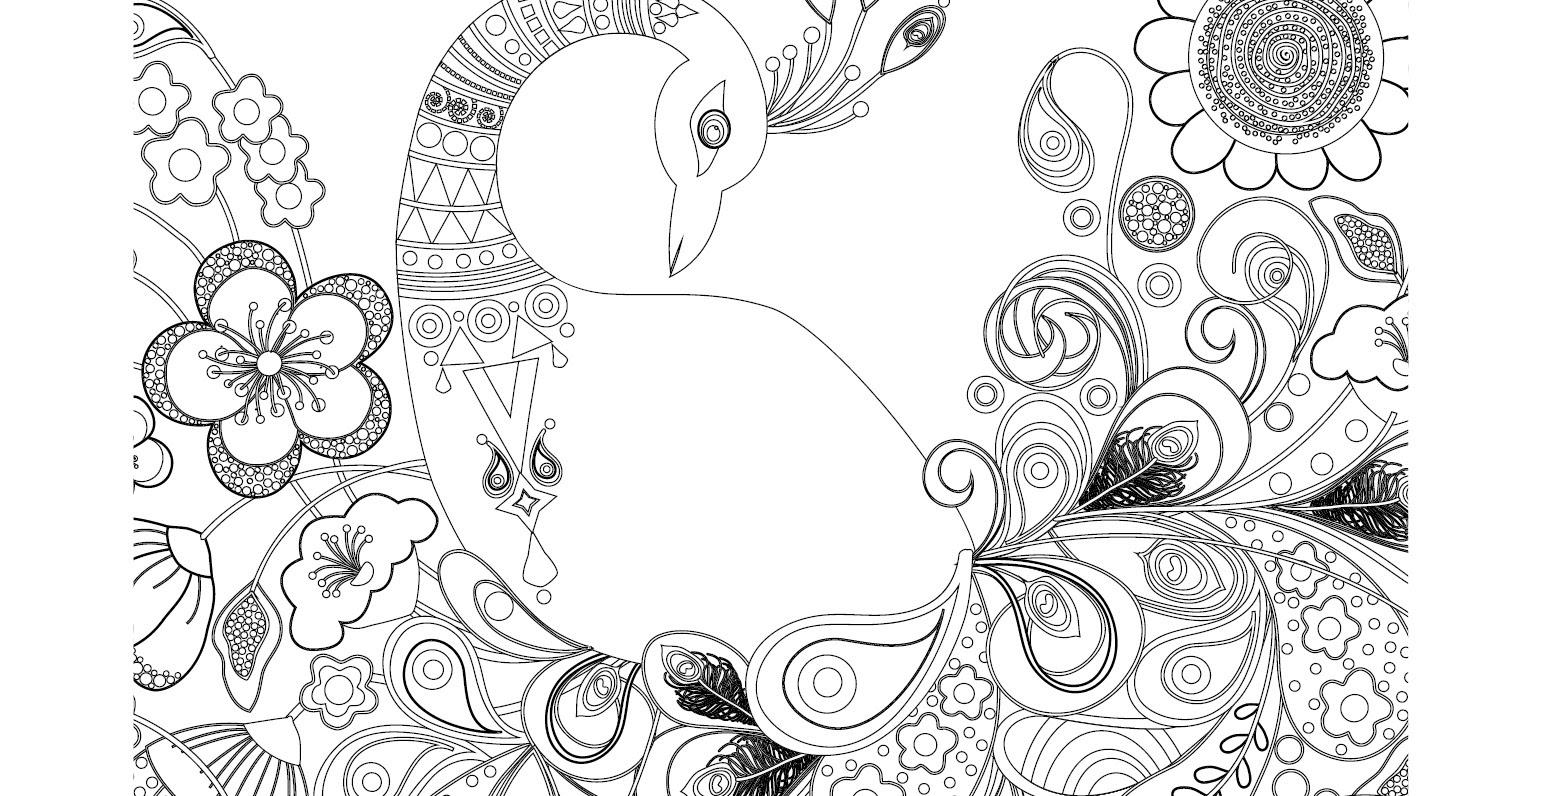 artherapie coloriage gratuit freedesignfile birthday